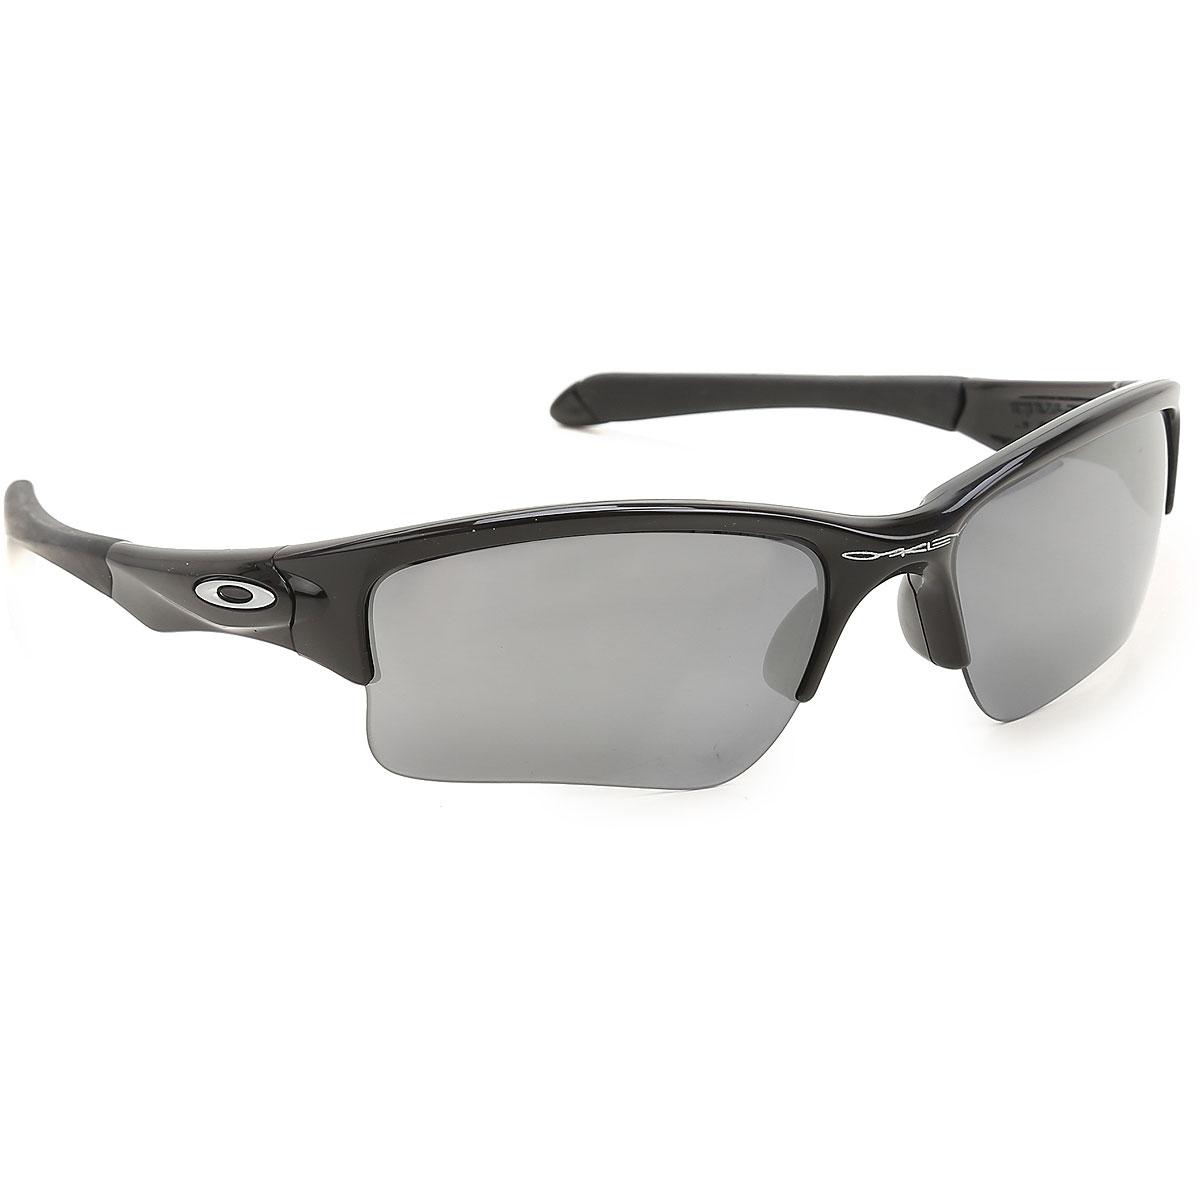 Image of Oakley Kids Sunglasses for Boys On Sale in Outlet, Black, 2017